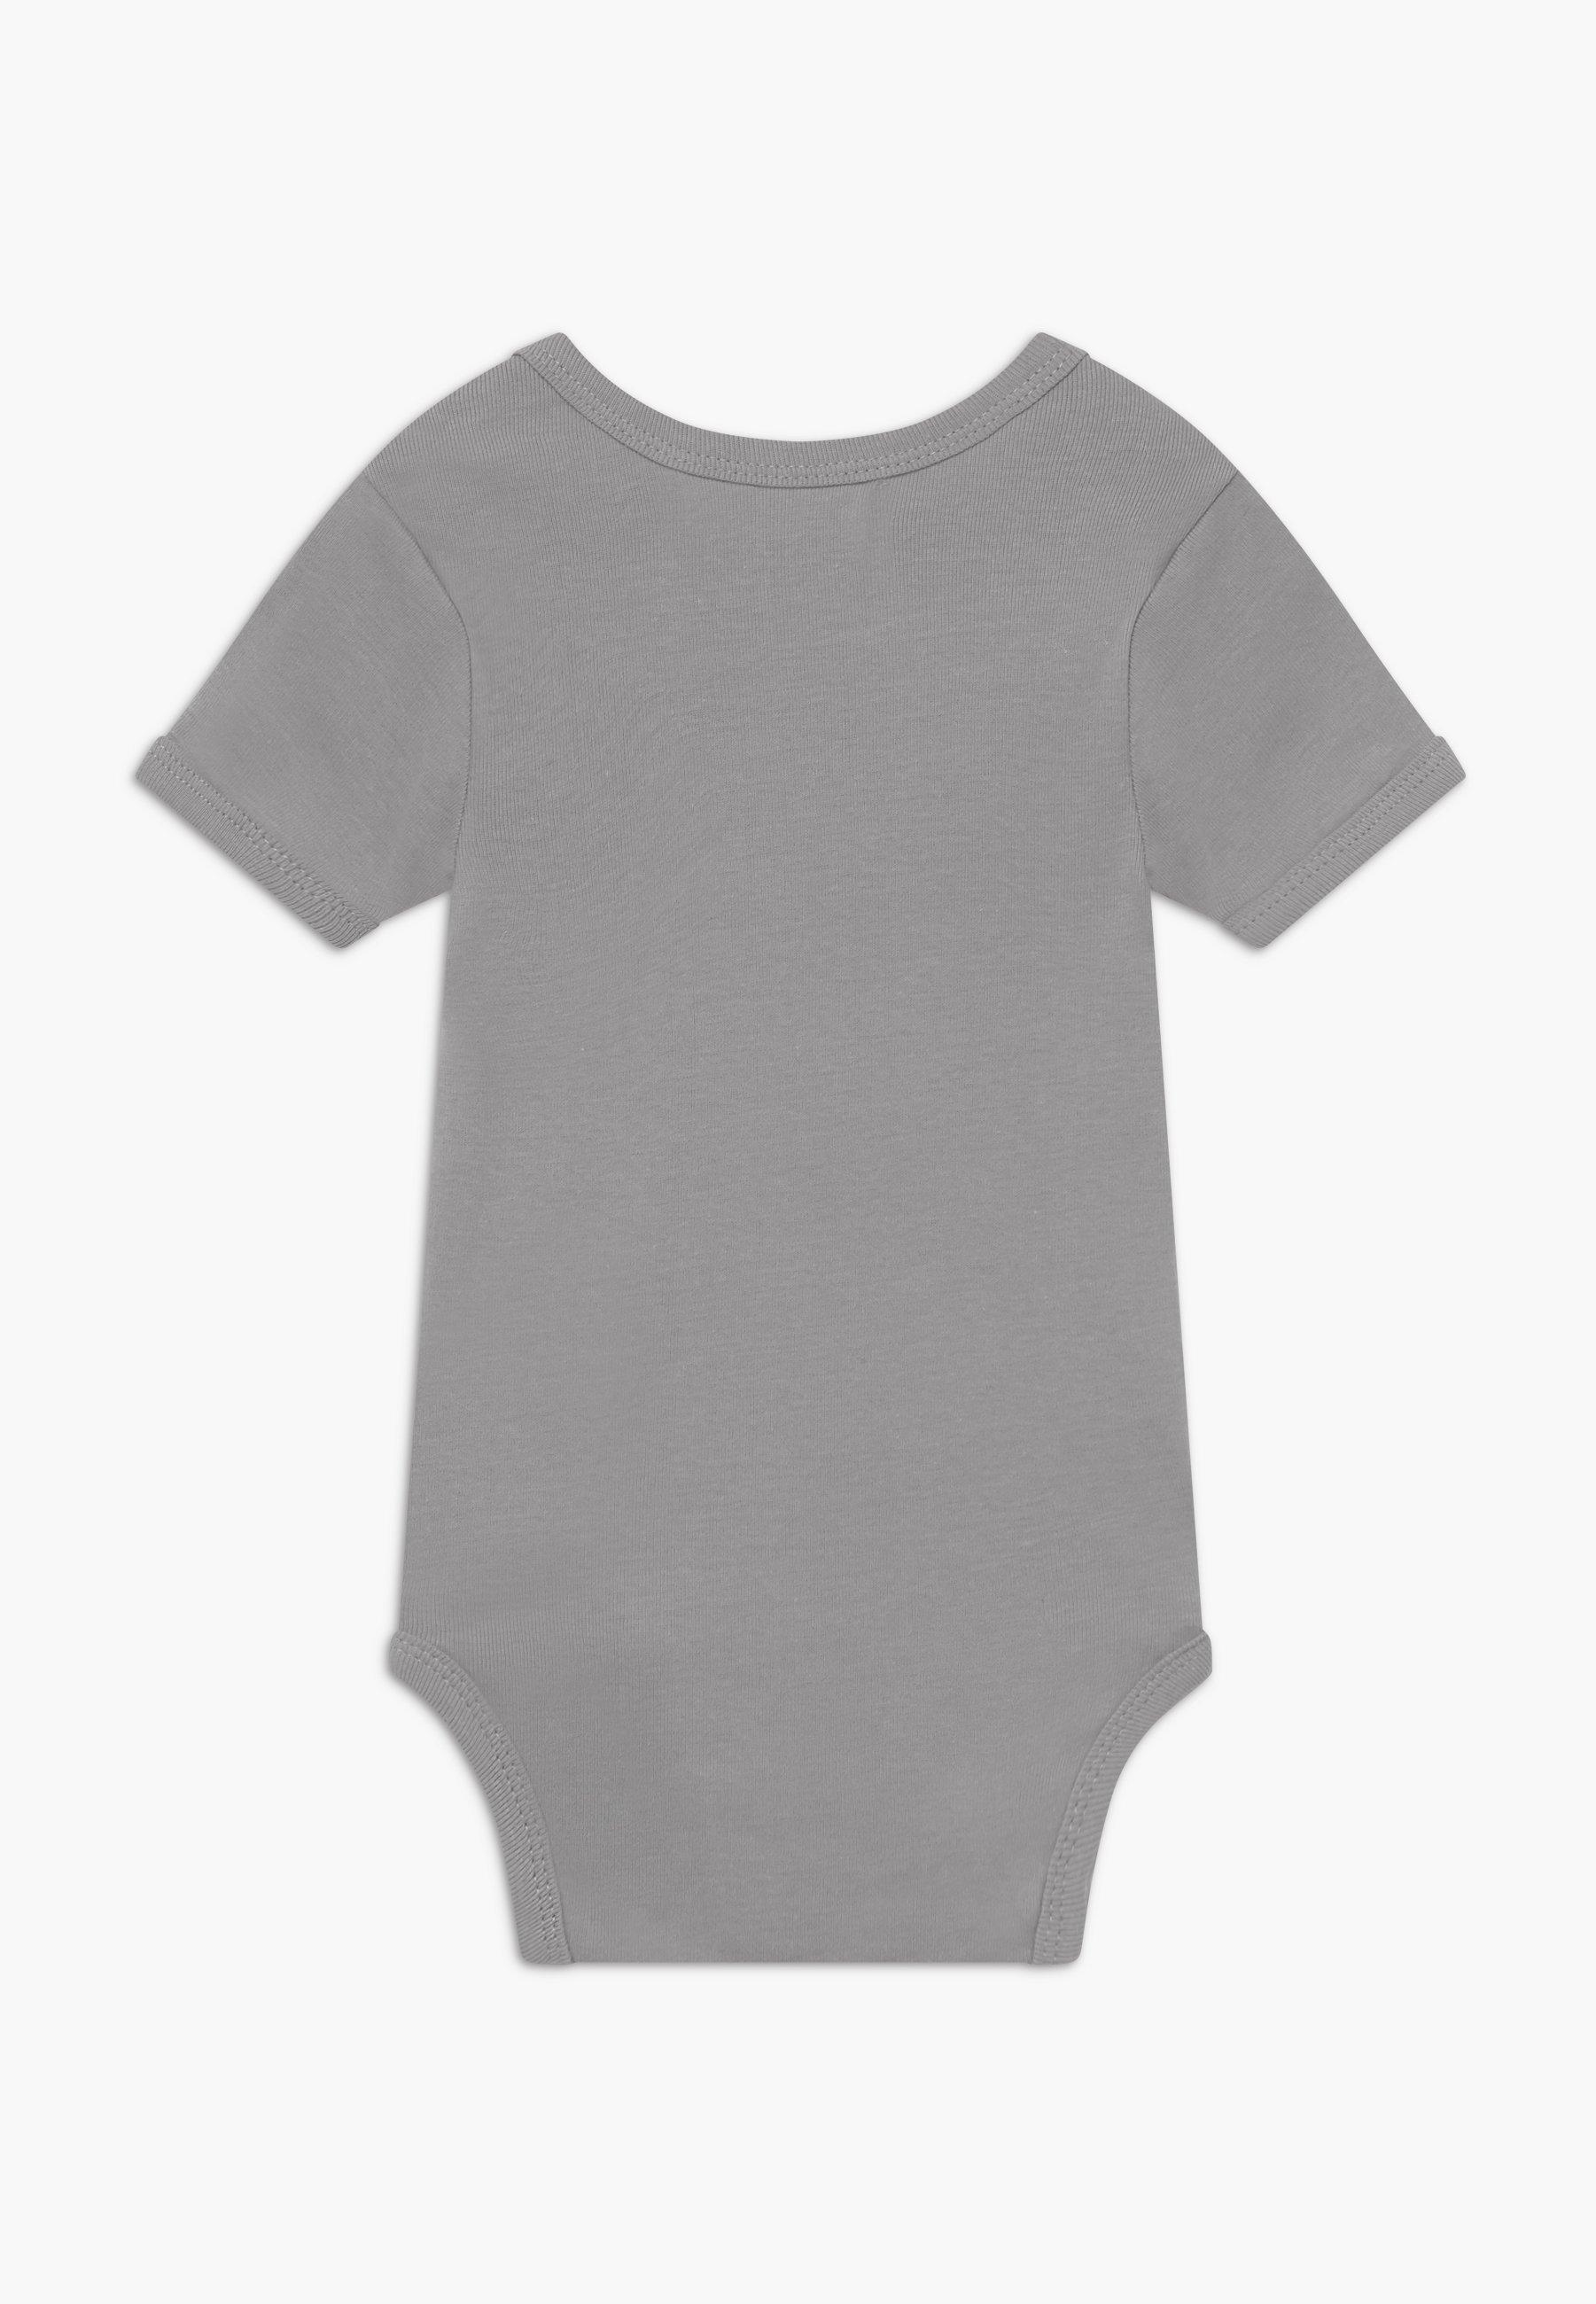 Sense Organics Baby 3 Pack - Body Green/navy/lilac Grey